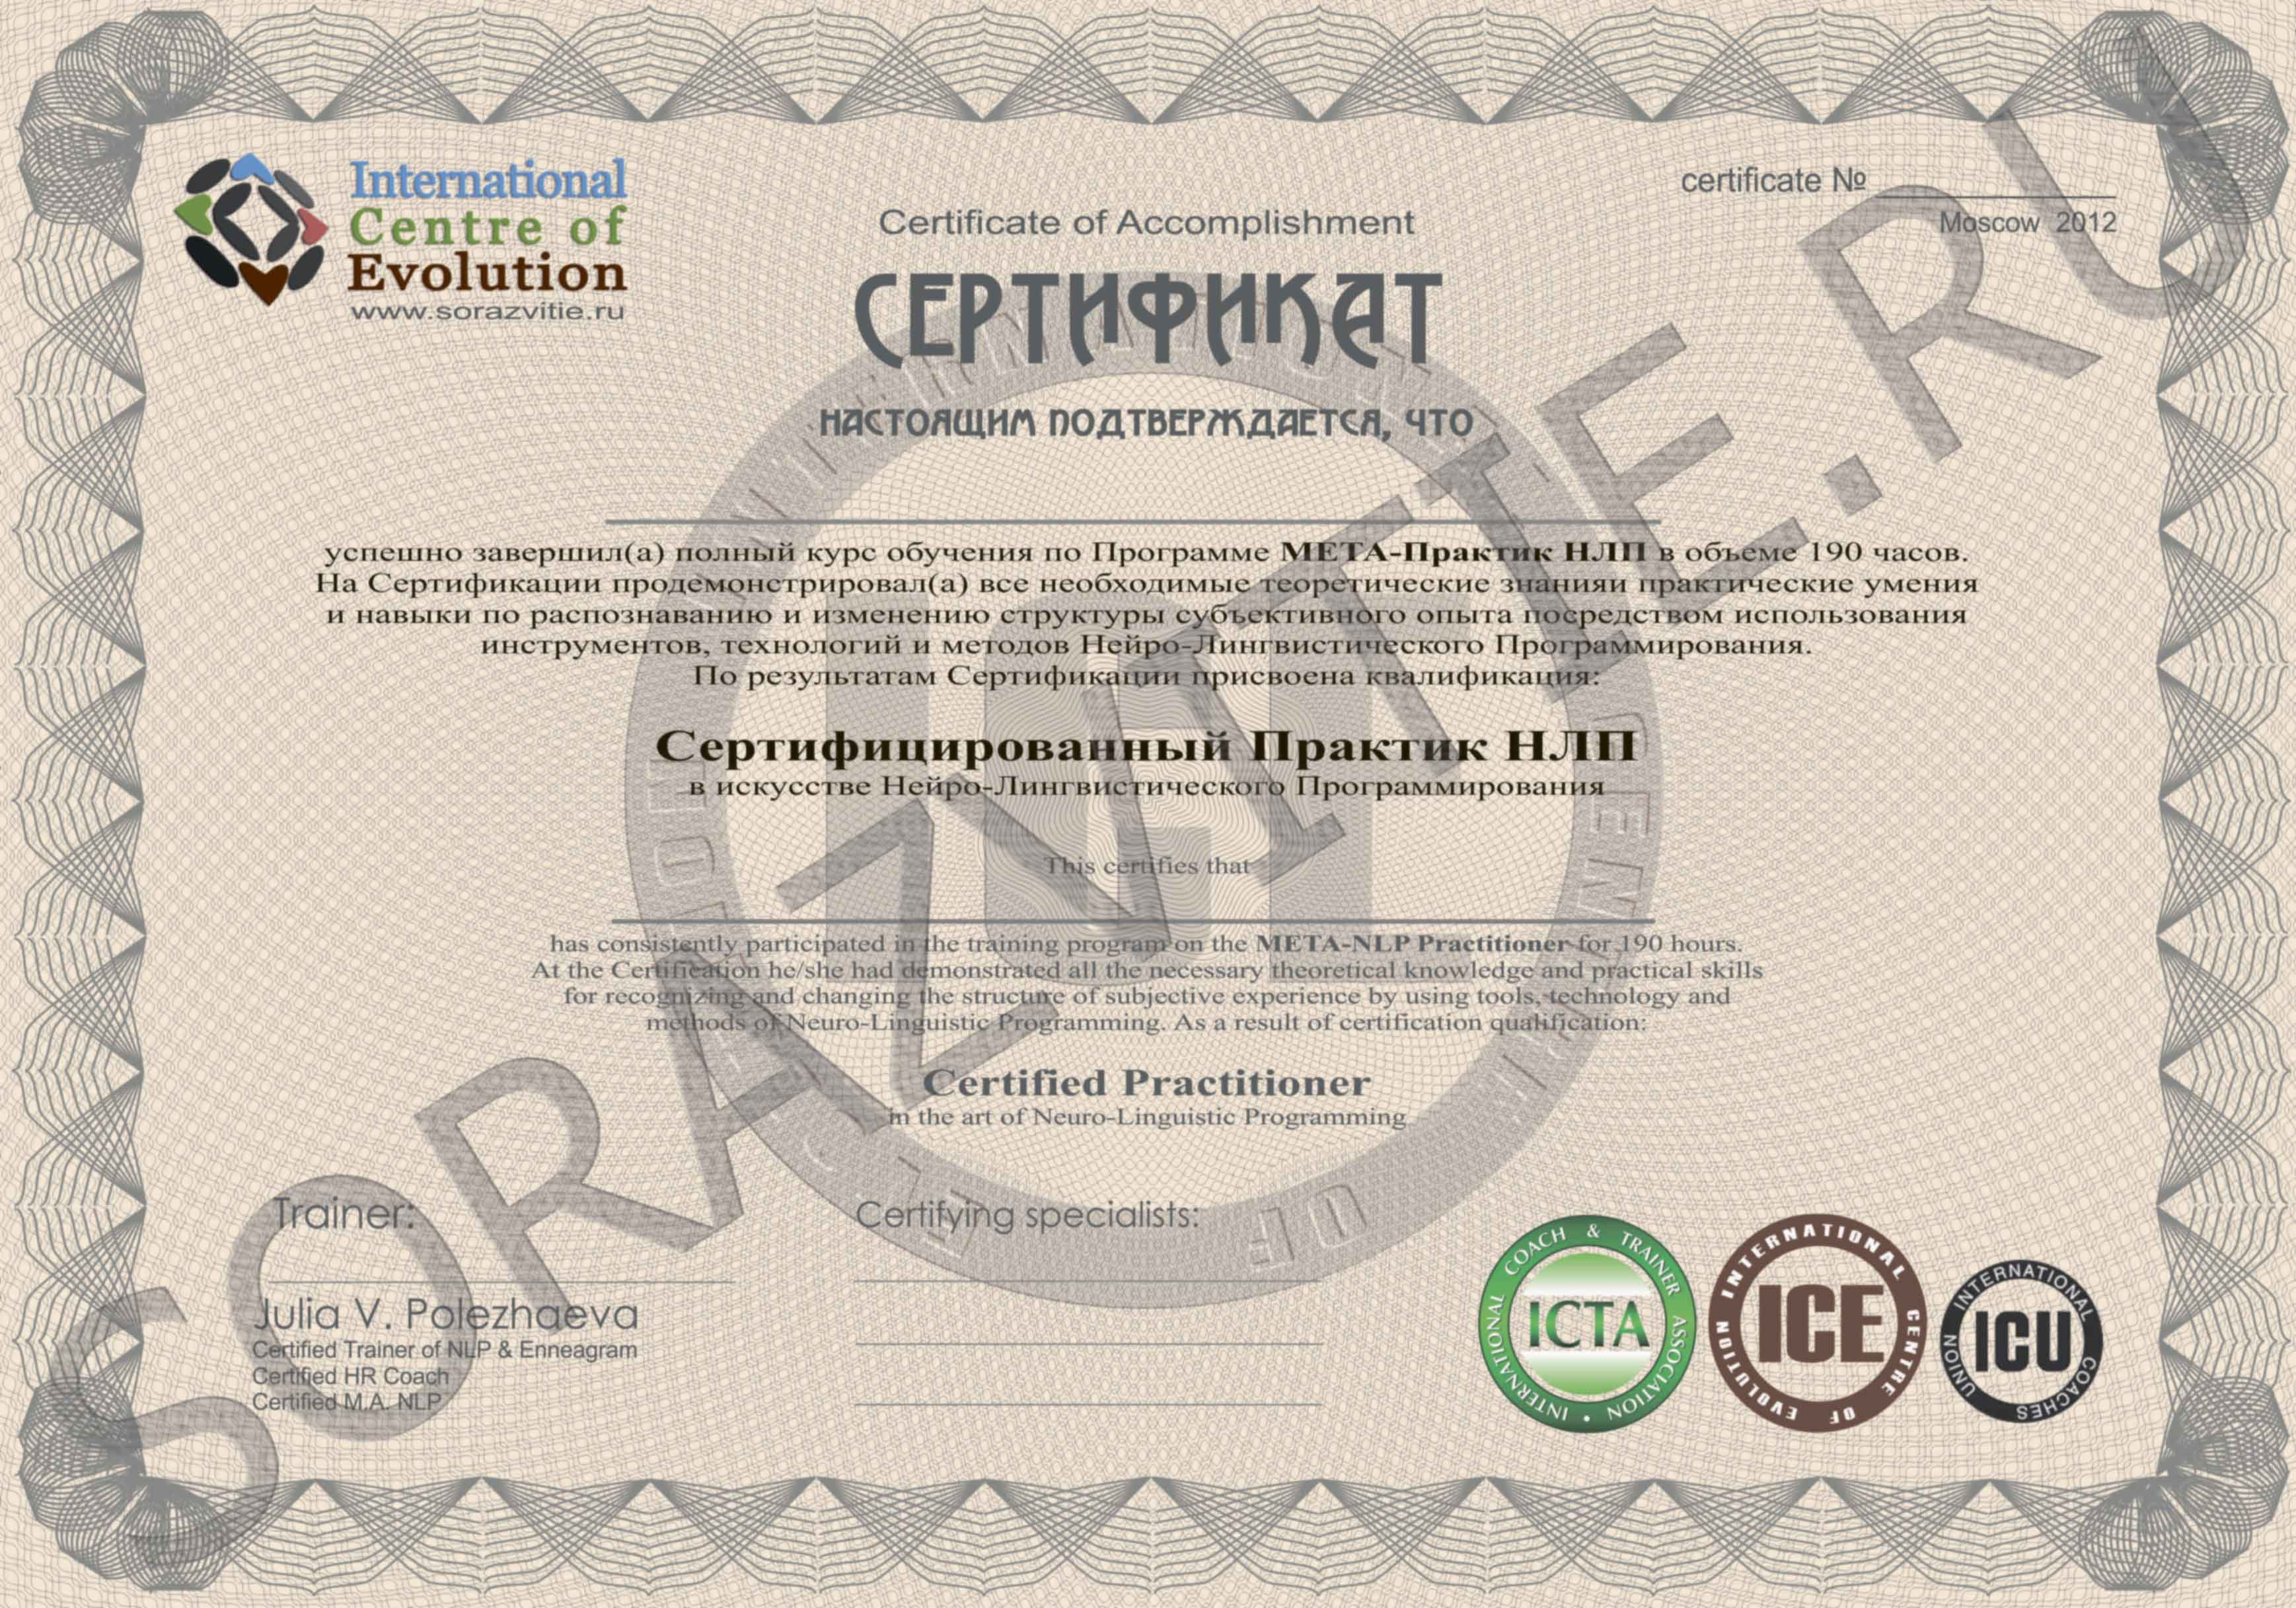 сертификат-бланк-мета-практик-нлп-серт.j